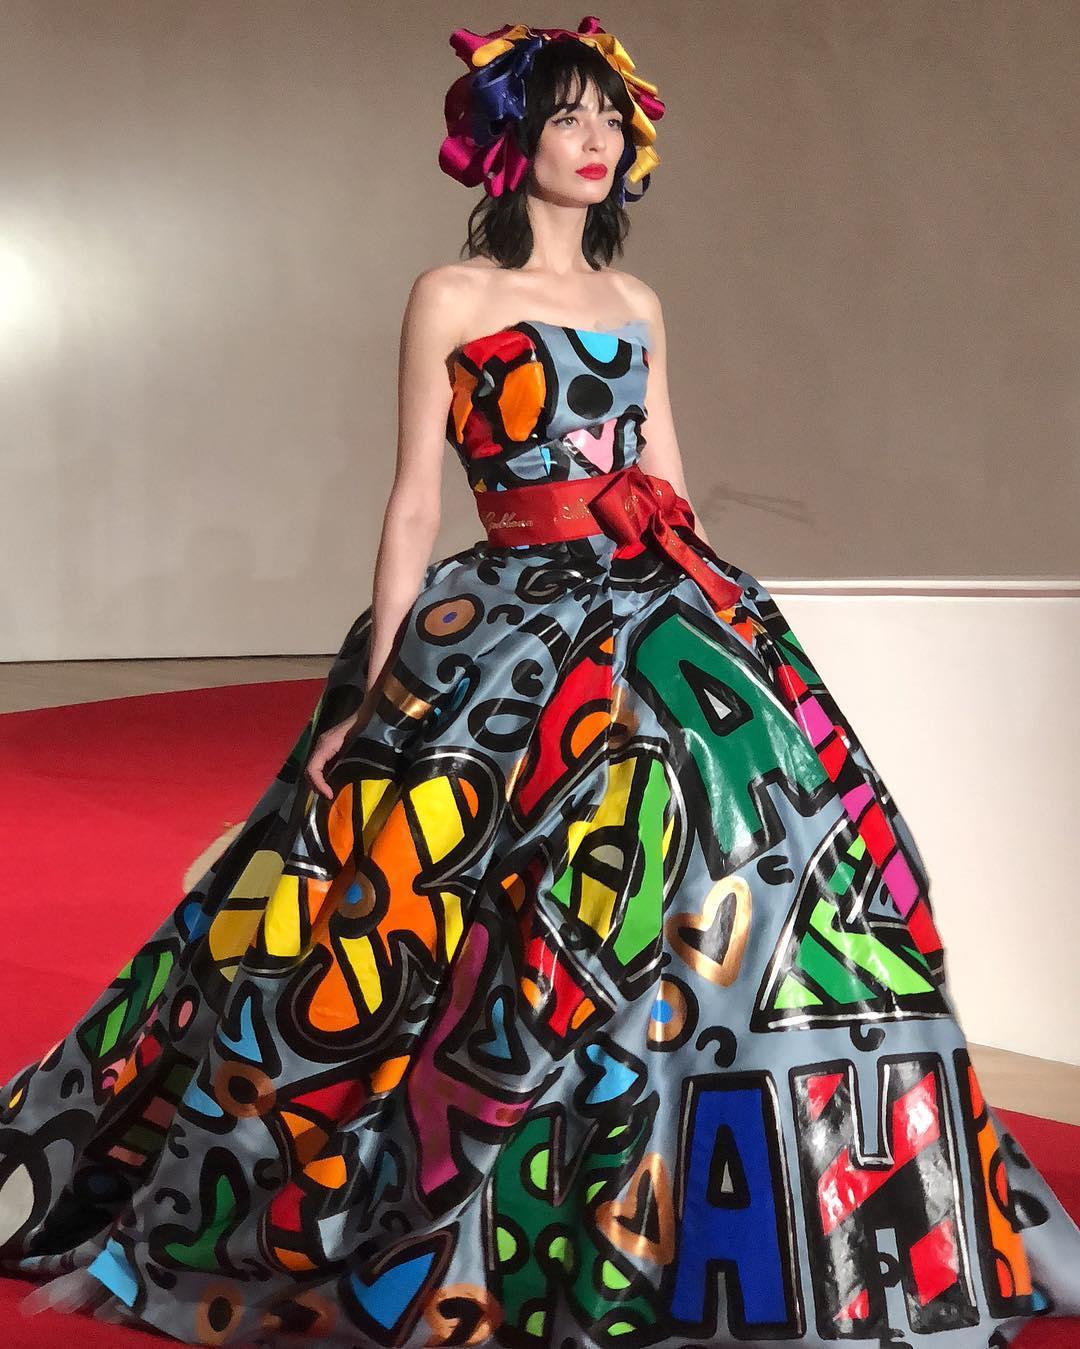 Vestido de Frida Kahlo por Dolce & Gabbana